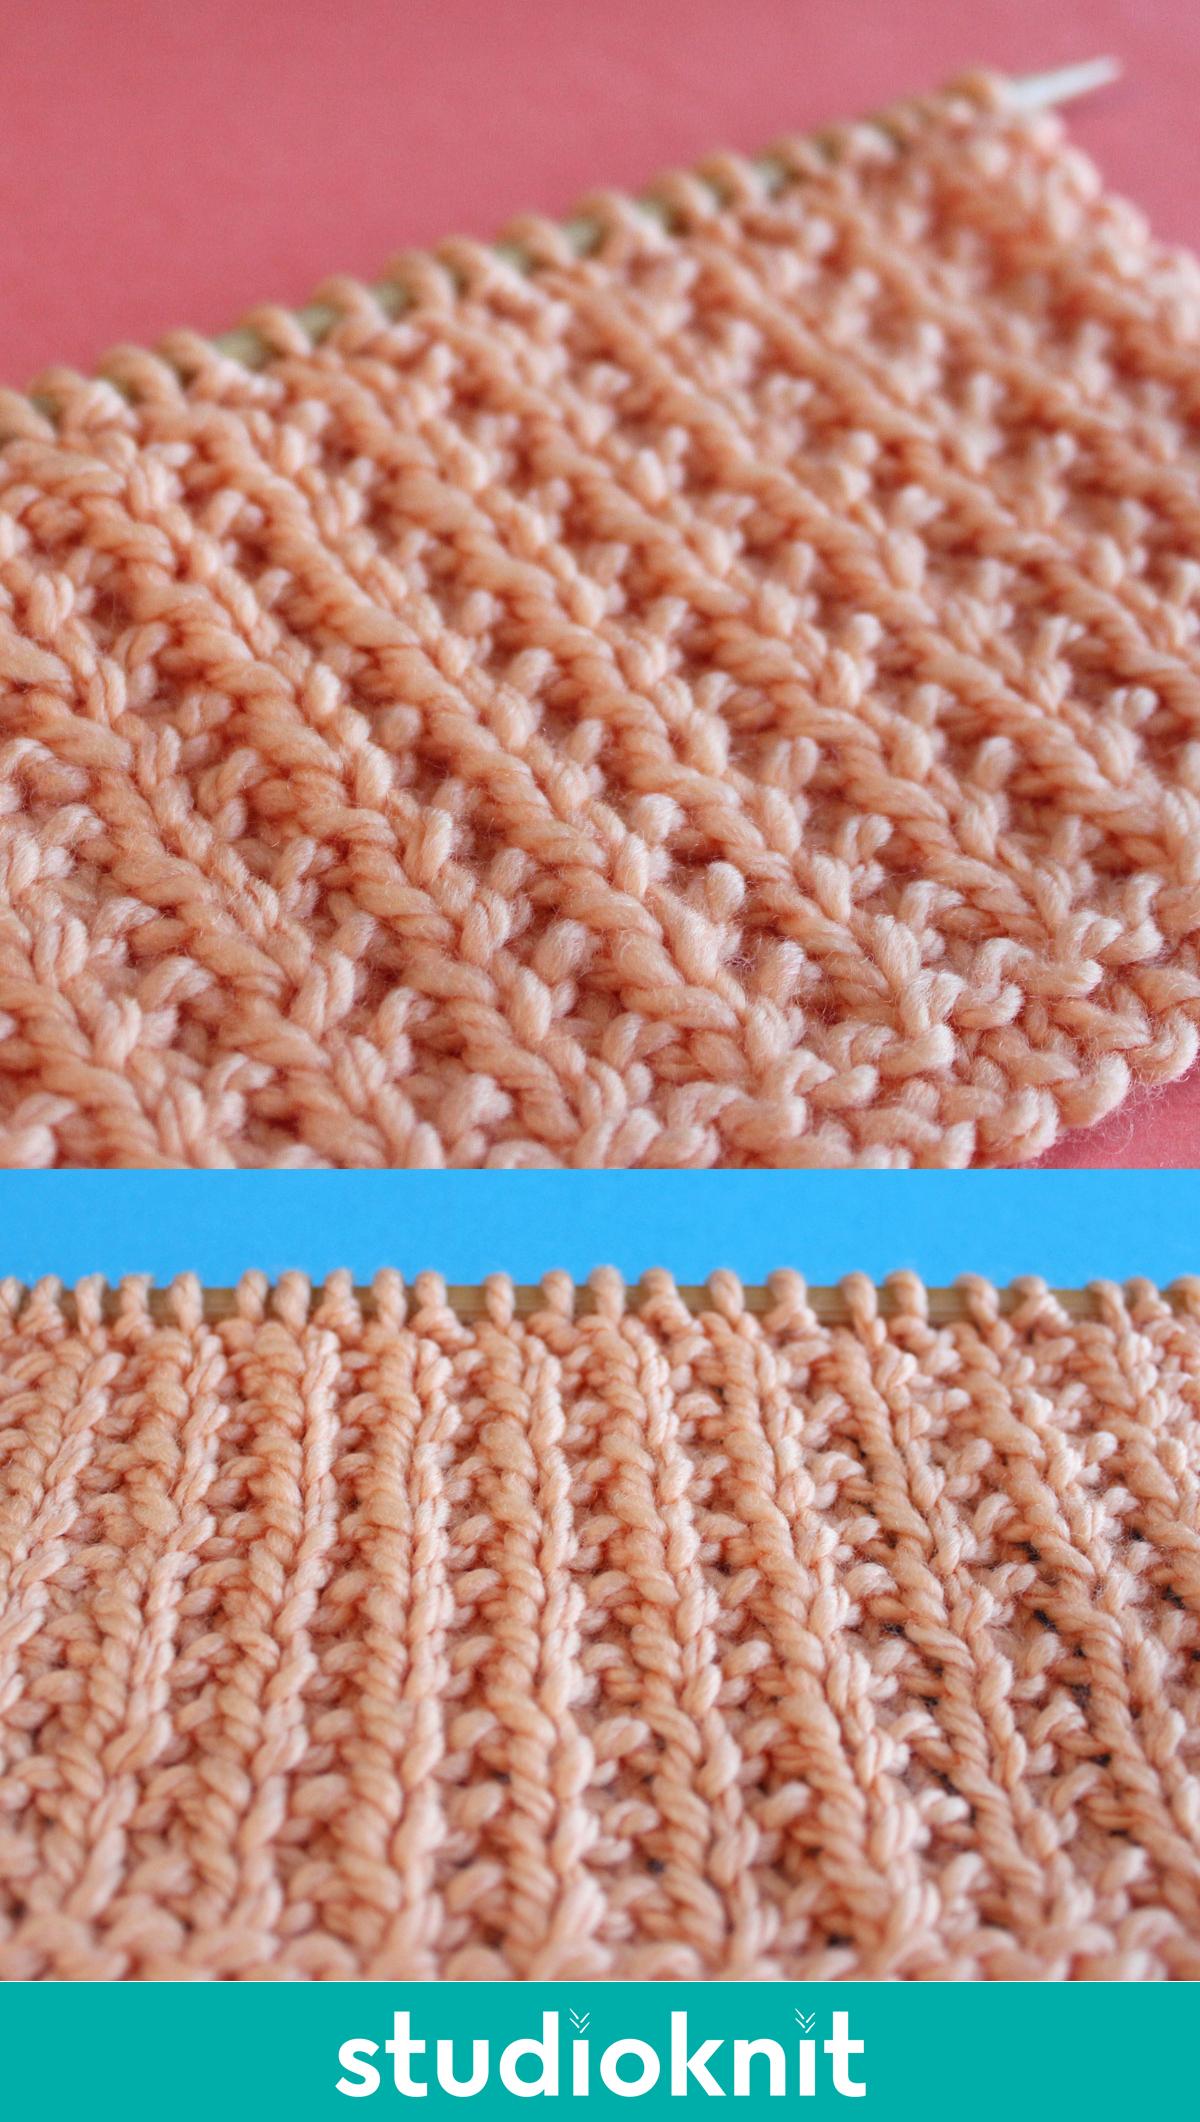 Two Close-ups of Broken Rib knitting swatch texture.